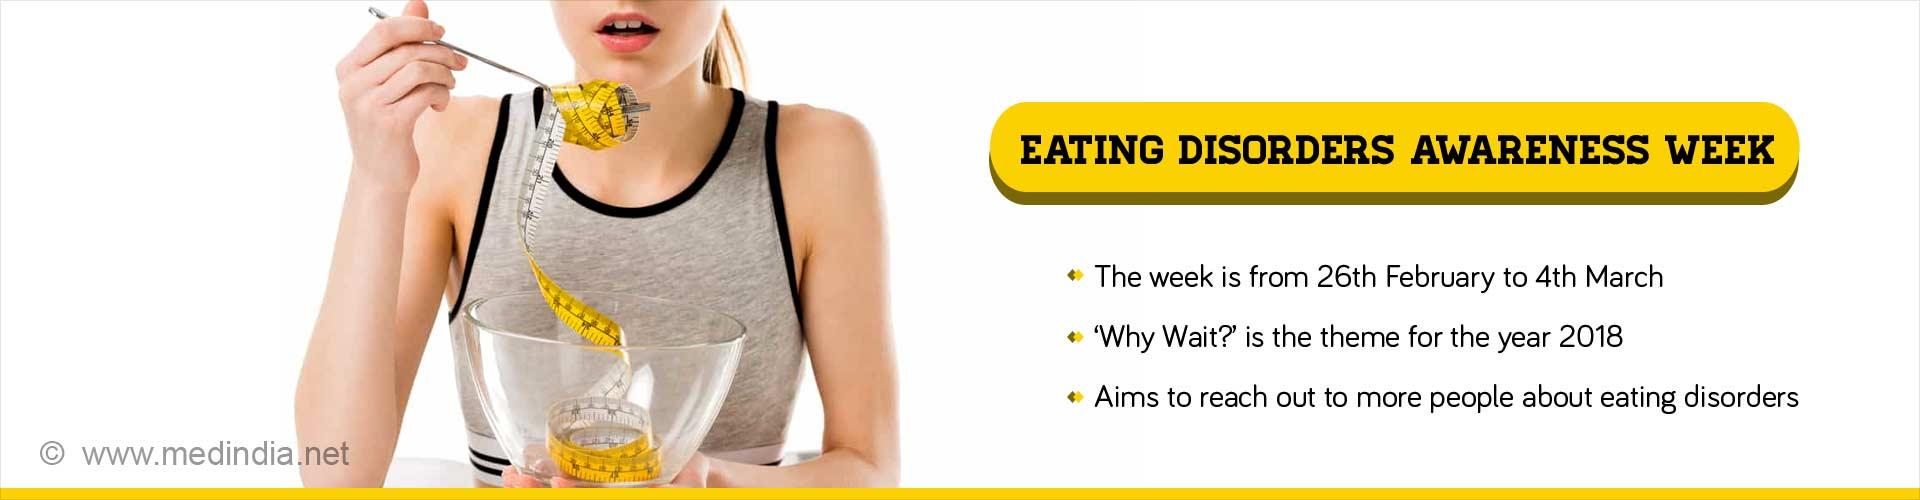 Eating Disorders Awareness Week 2018: Why Wait?